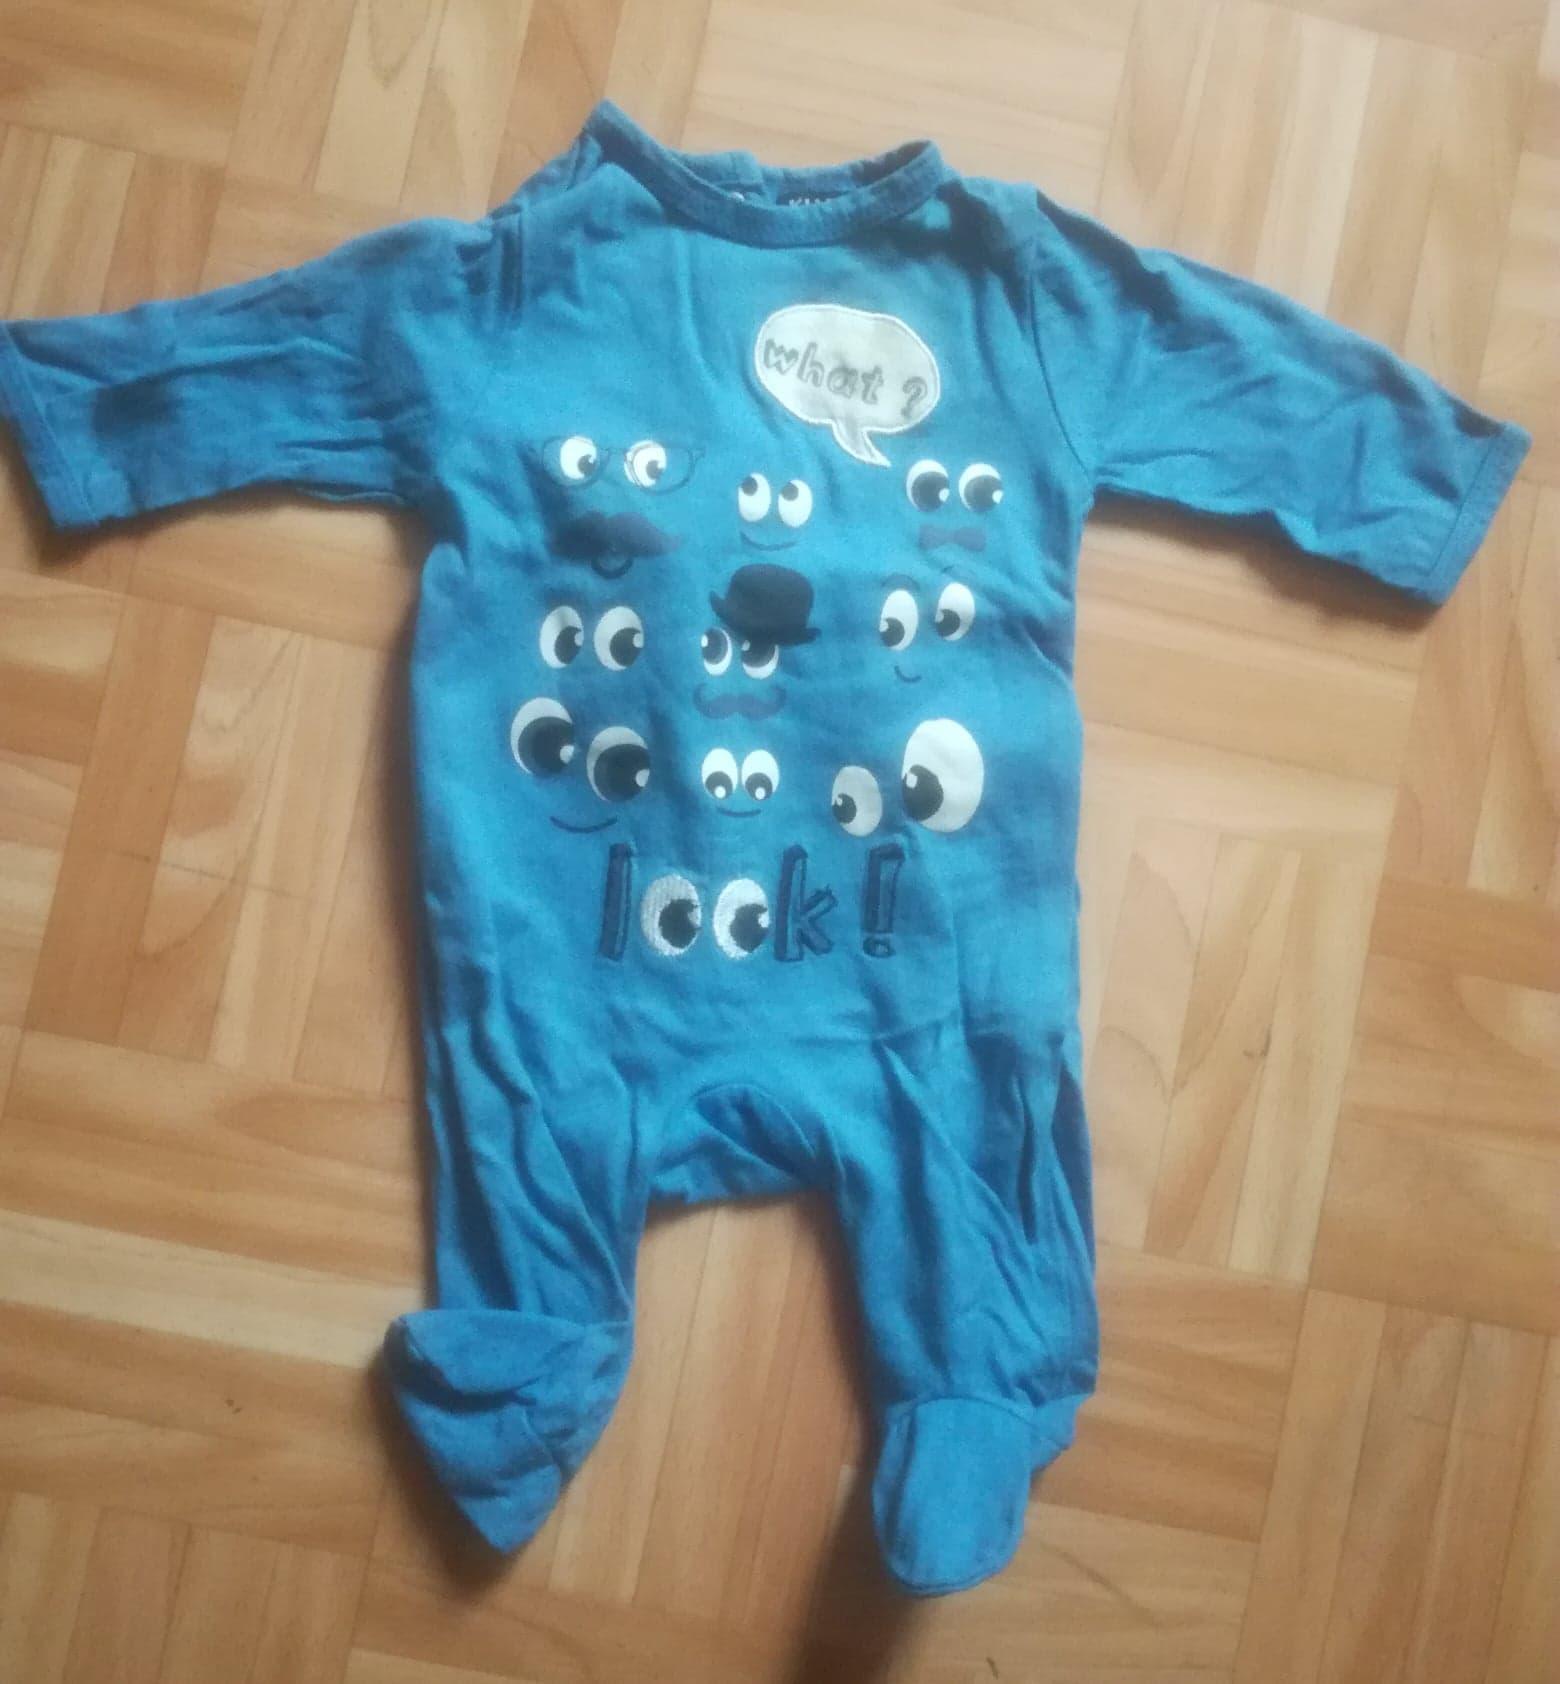 troc de troc lot 3 pyjama 1 mois image 0